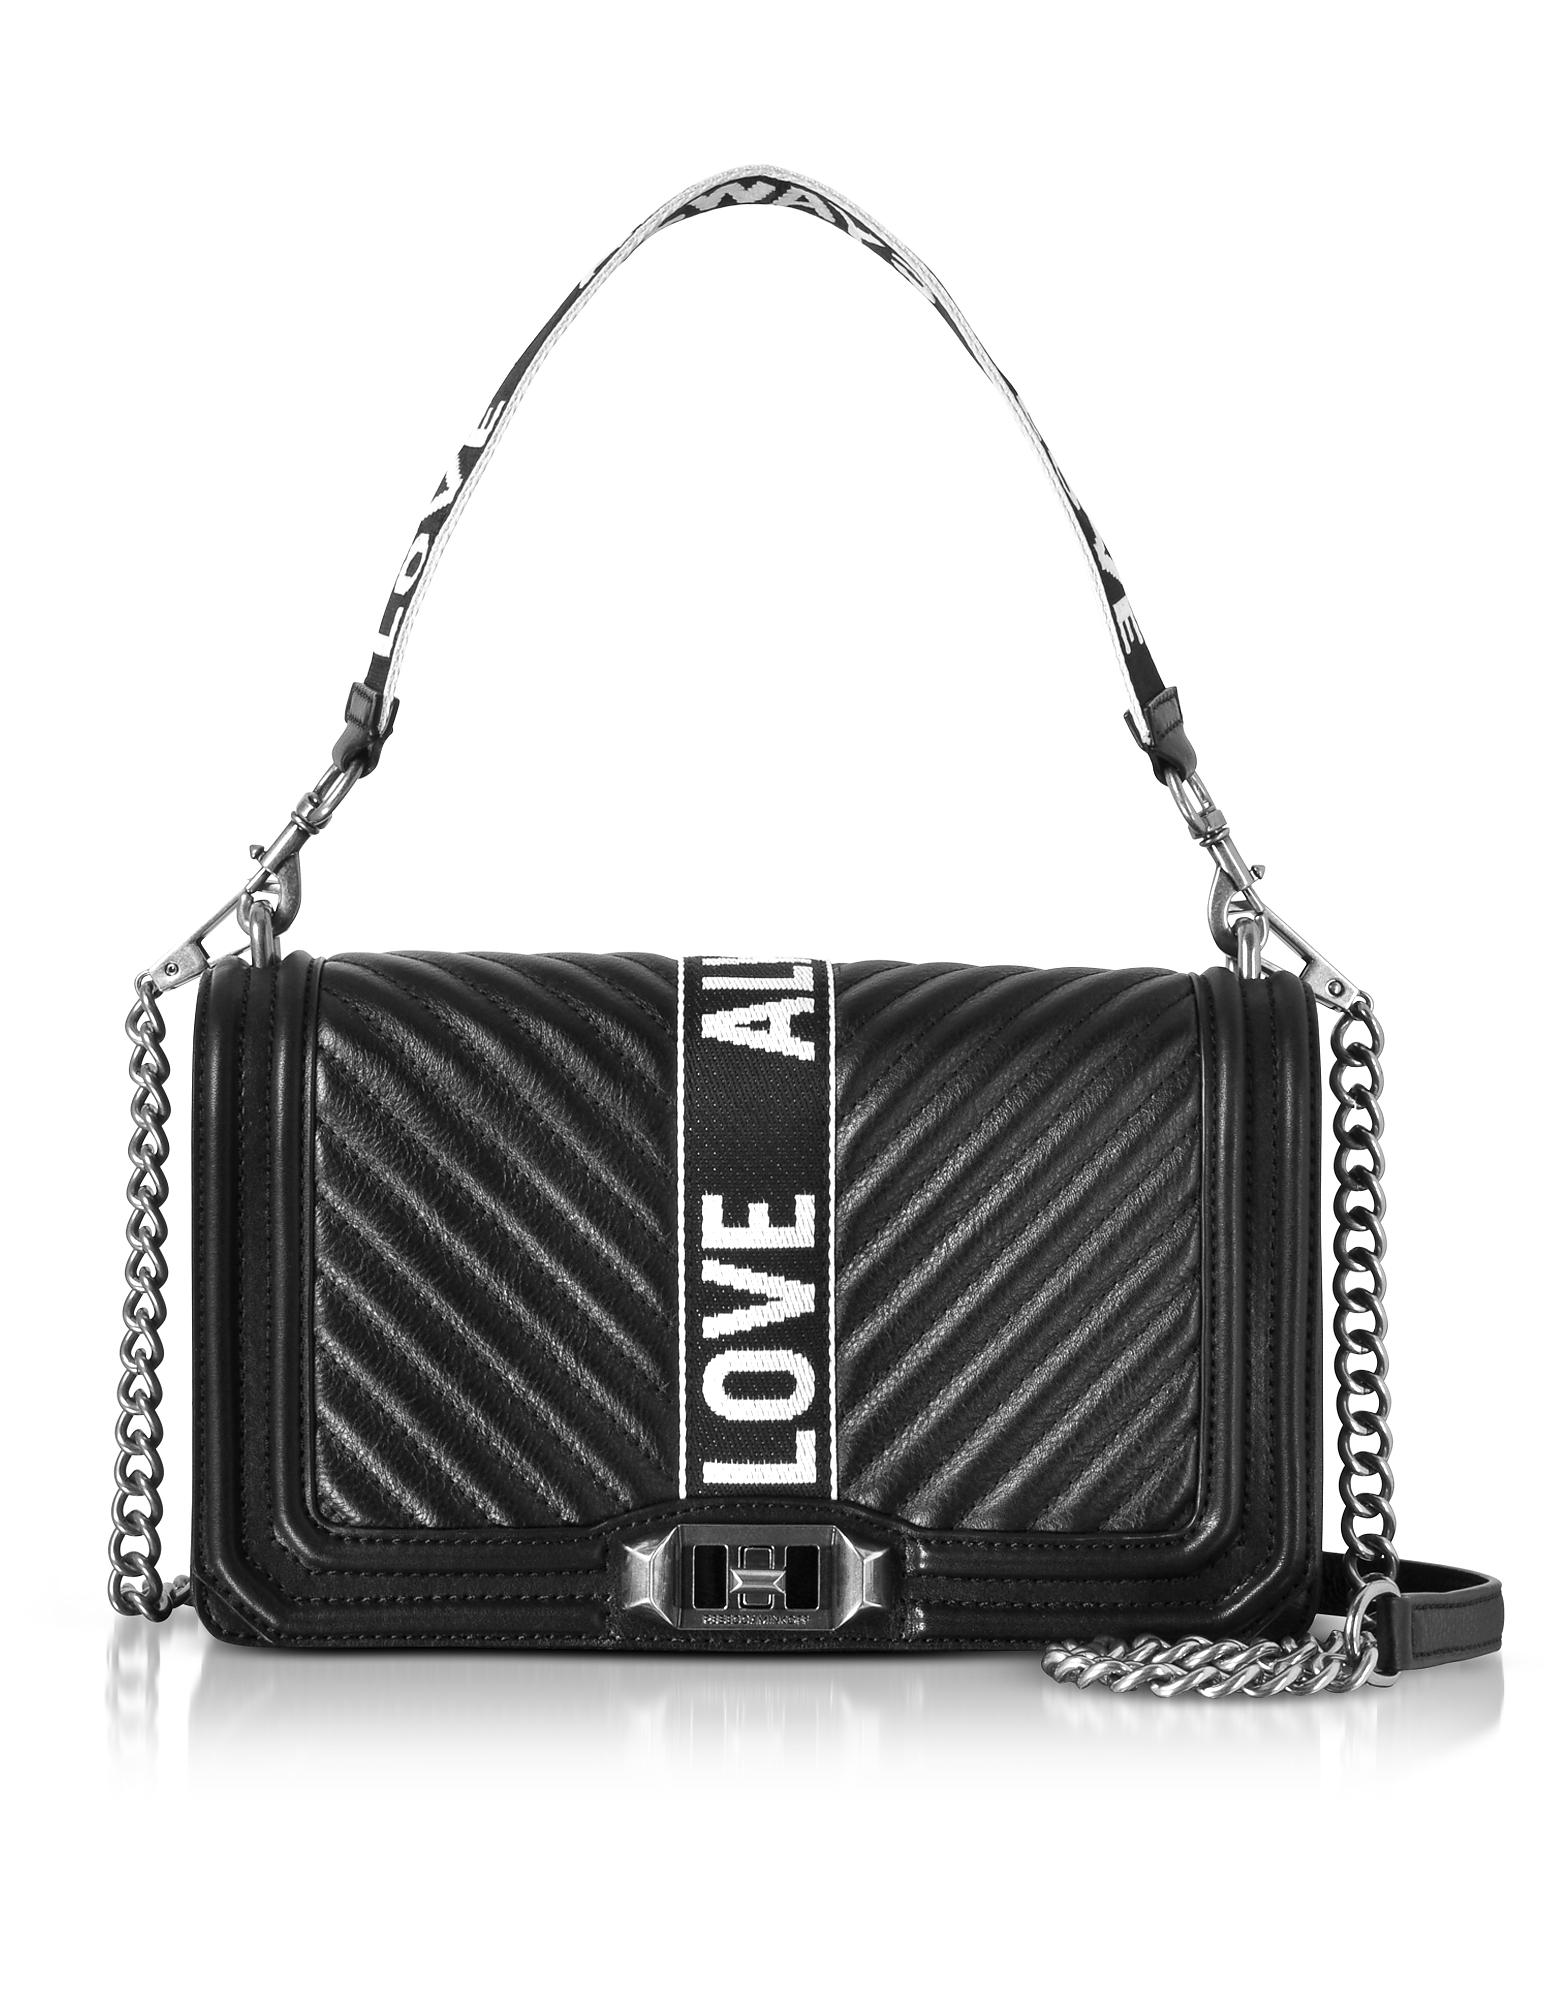 Rebecca Minkoff Handbags, Black Leather Love Crossbody Bag